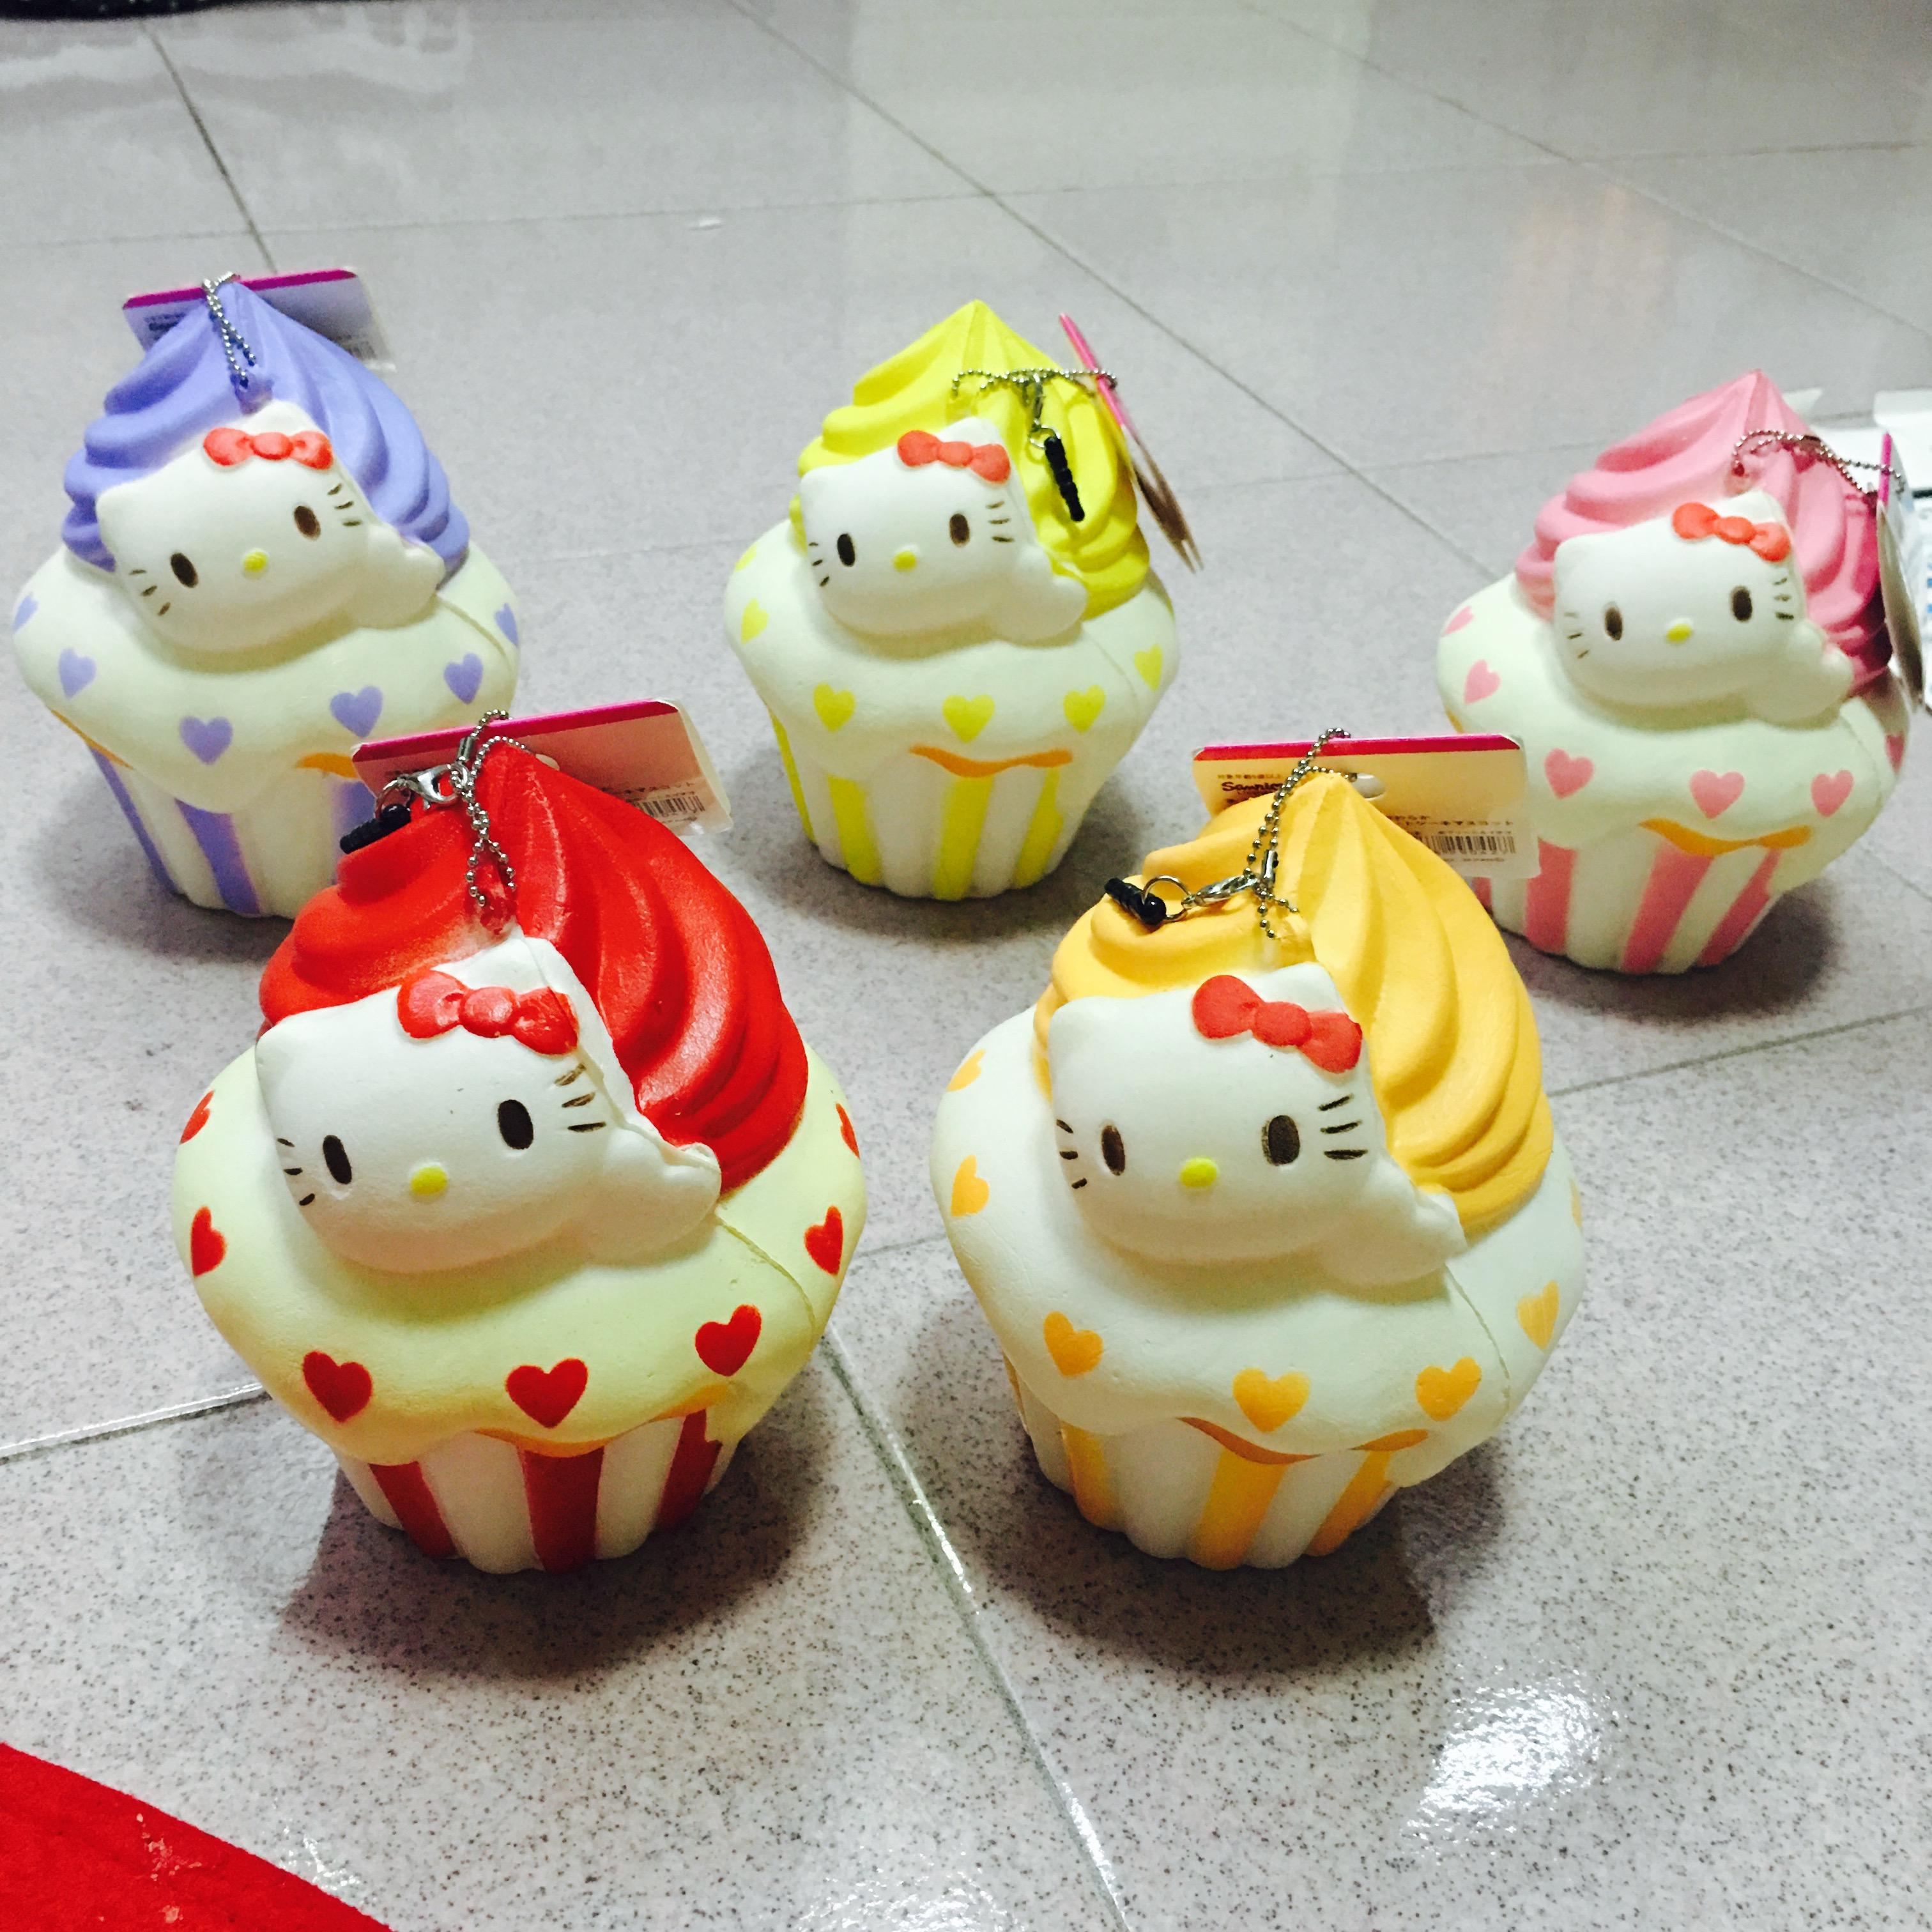 Squishy Cupcake : ~SquishyStuff~ HUGE Cute Hello Kitty Colorful Cupcake Squishy Mascot Online Store Powered by ...